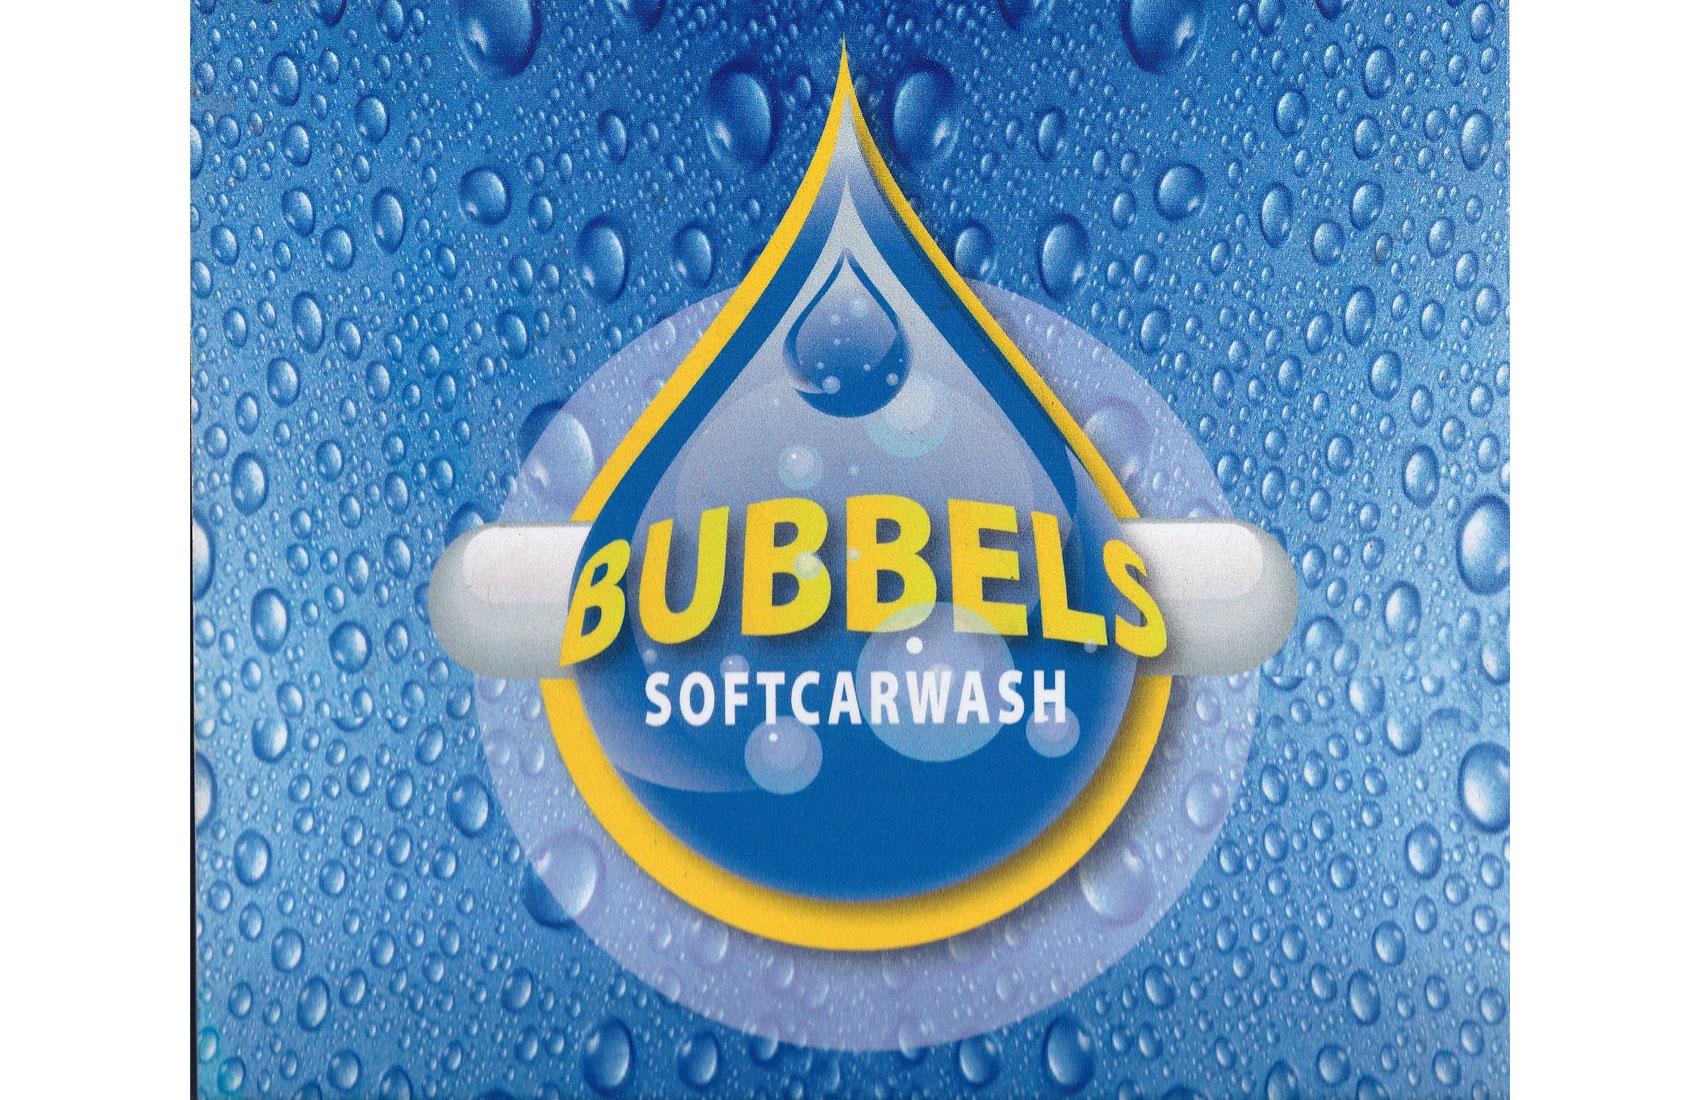 Carwash Bubbels